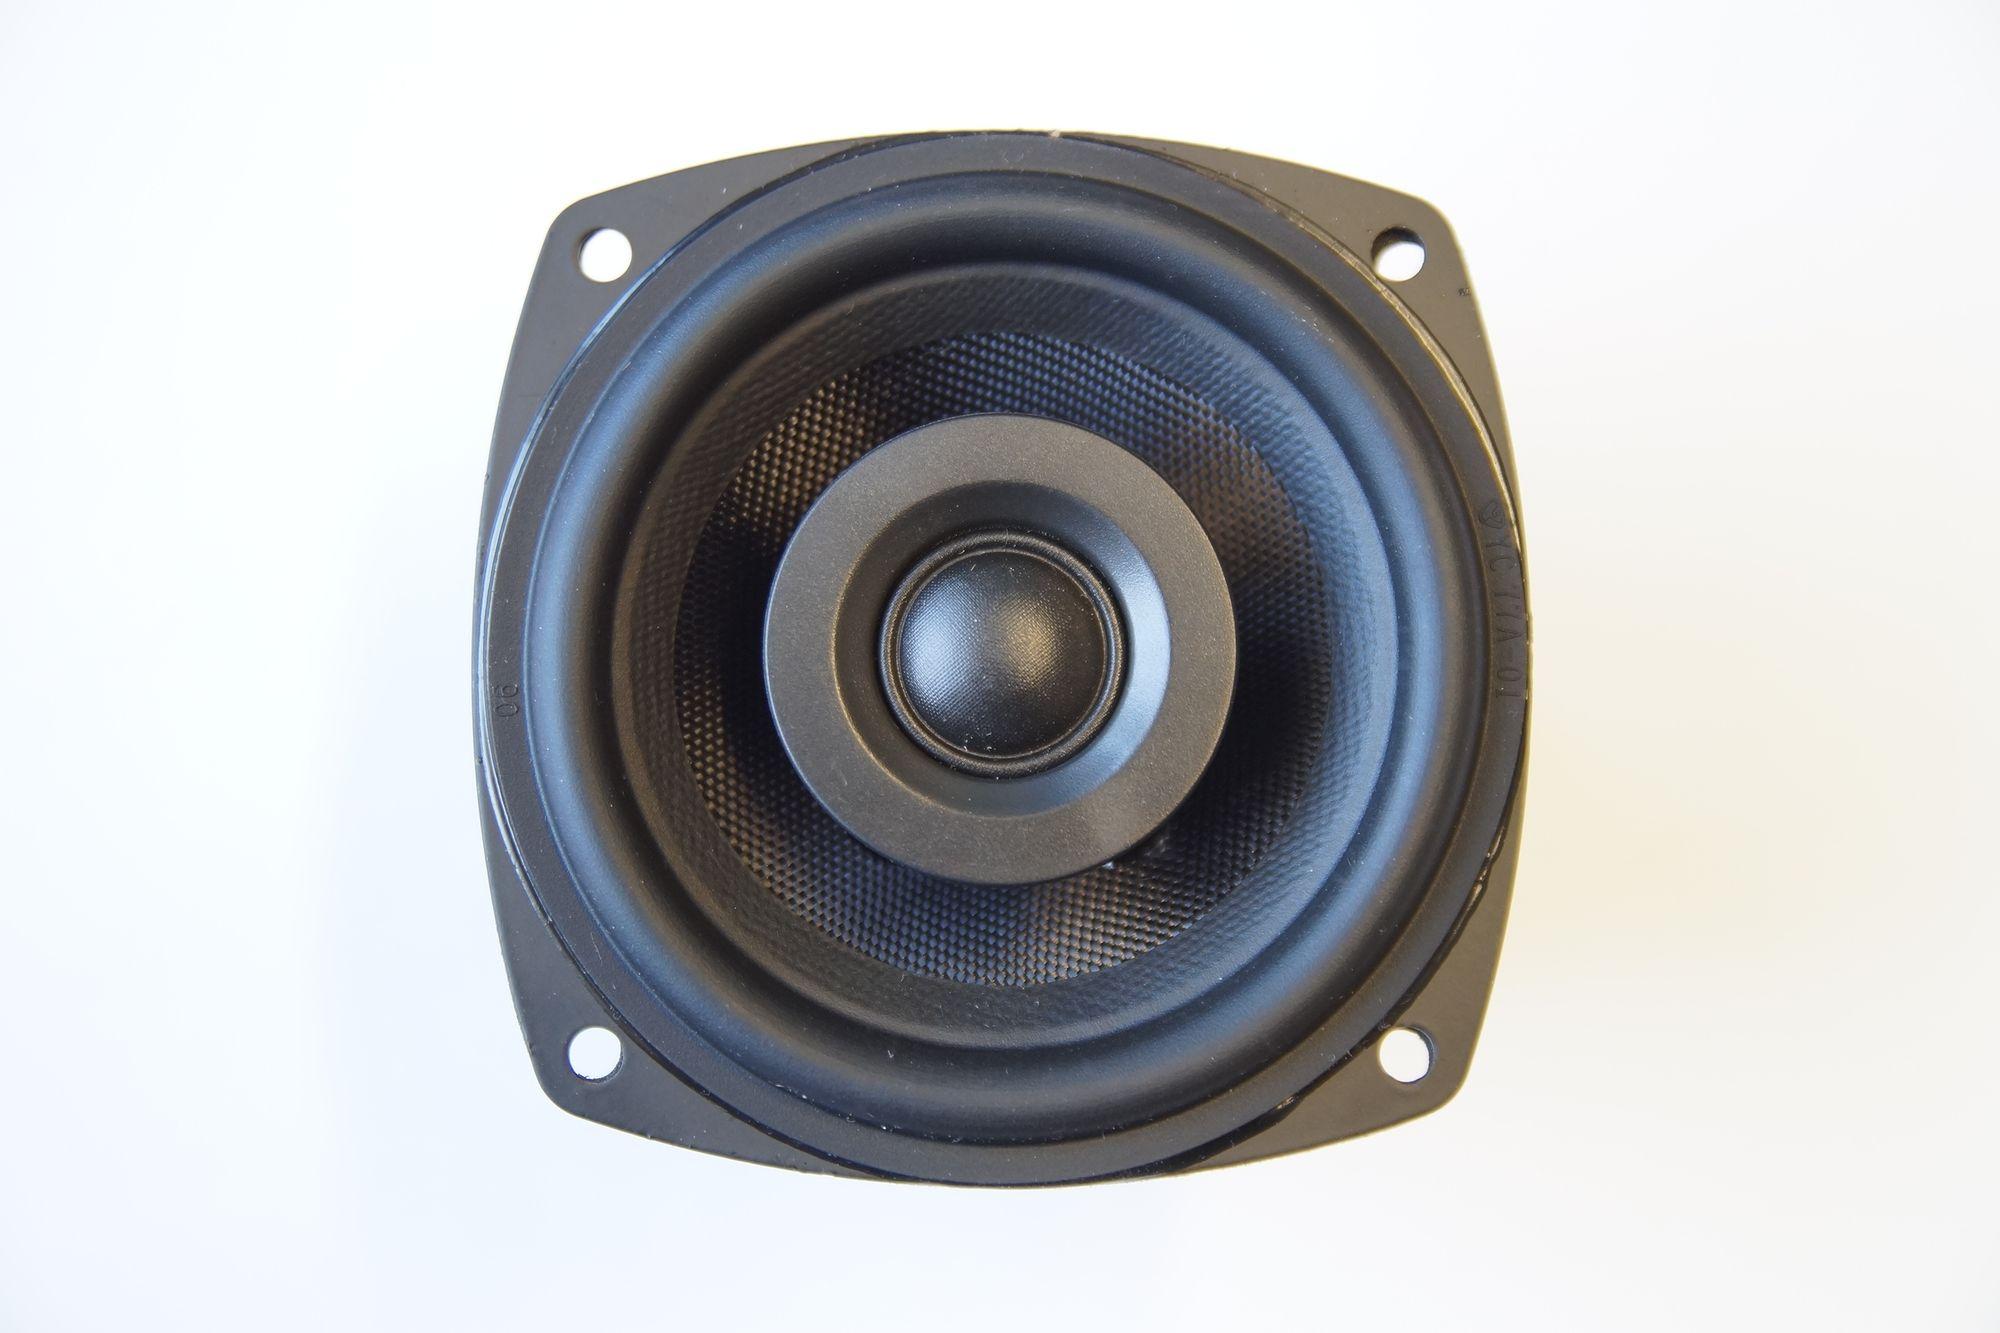 1 Stück Coax Lautsprecher Magnat MCO 90 S-GF 870 D / Art.Nr.: 349512 Serviceware